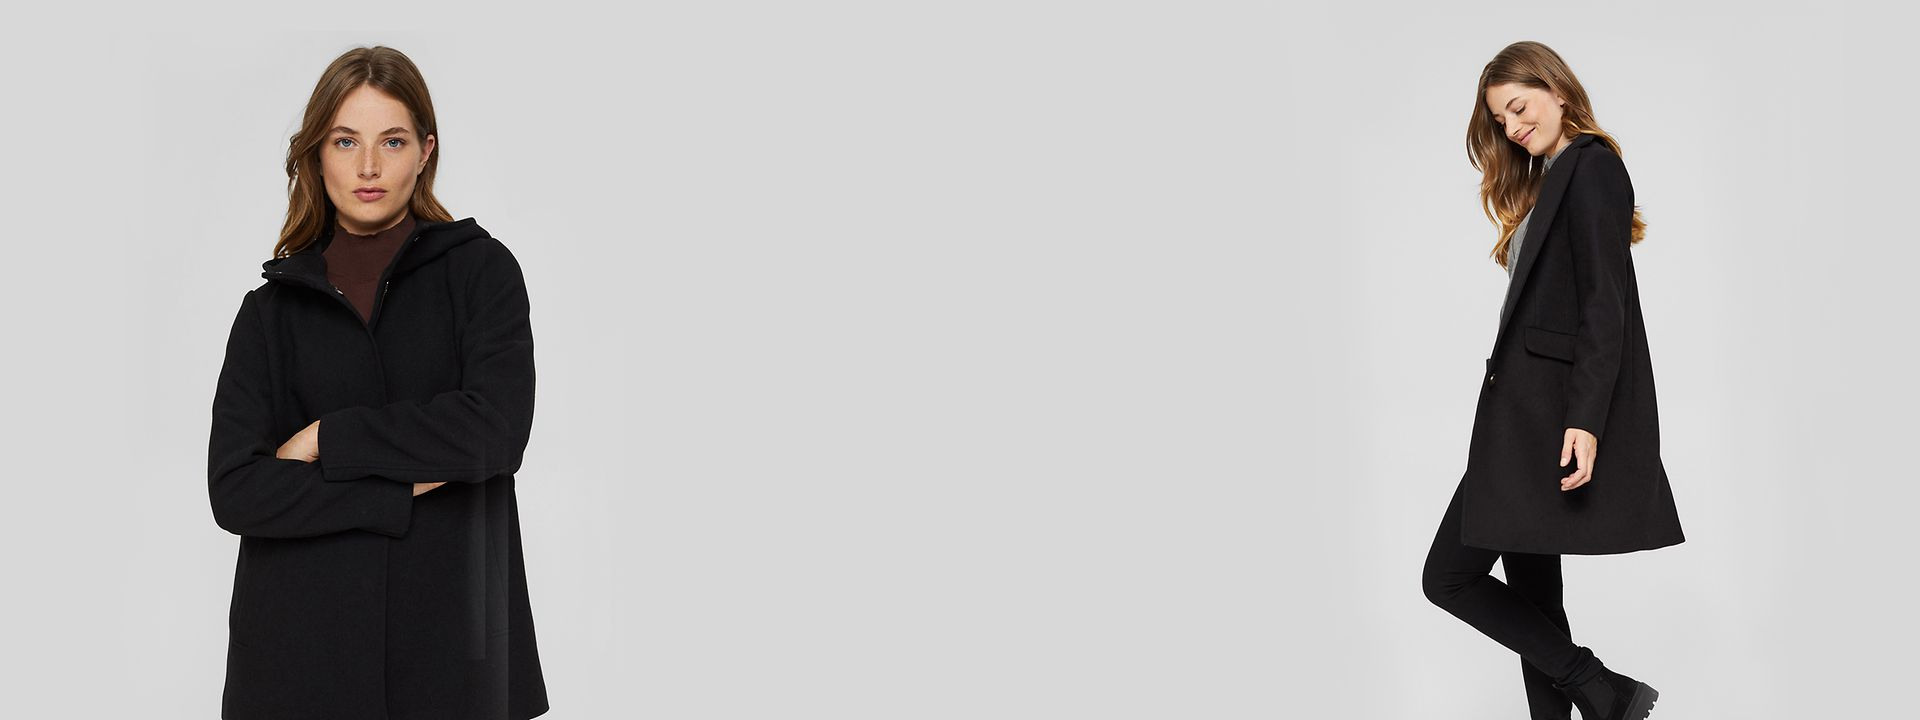 152021 - women - startpage -main banner -outerwear promo